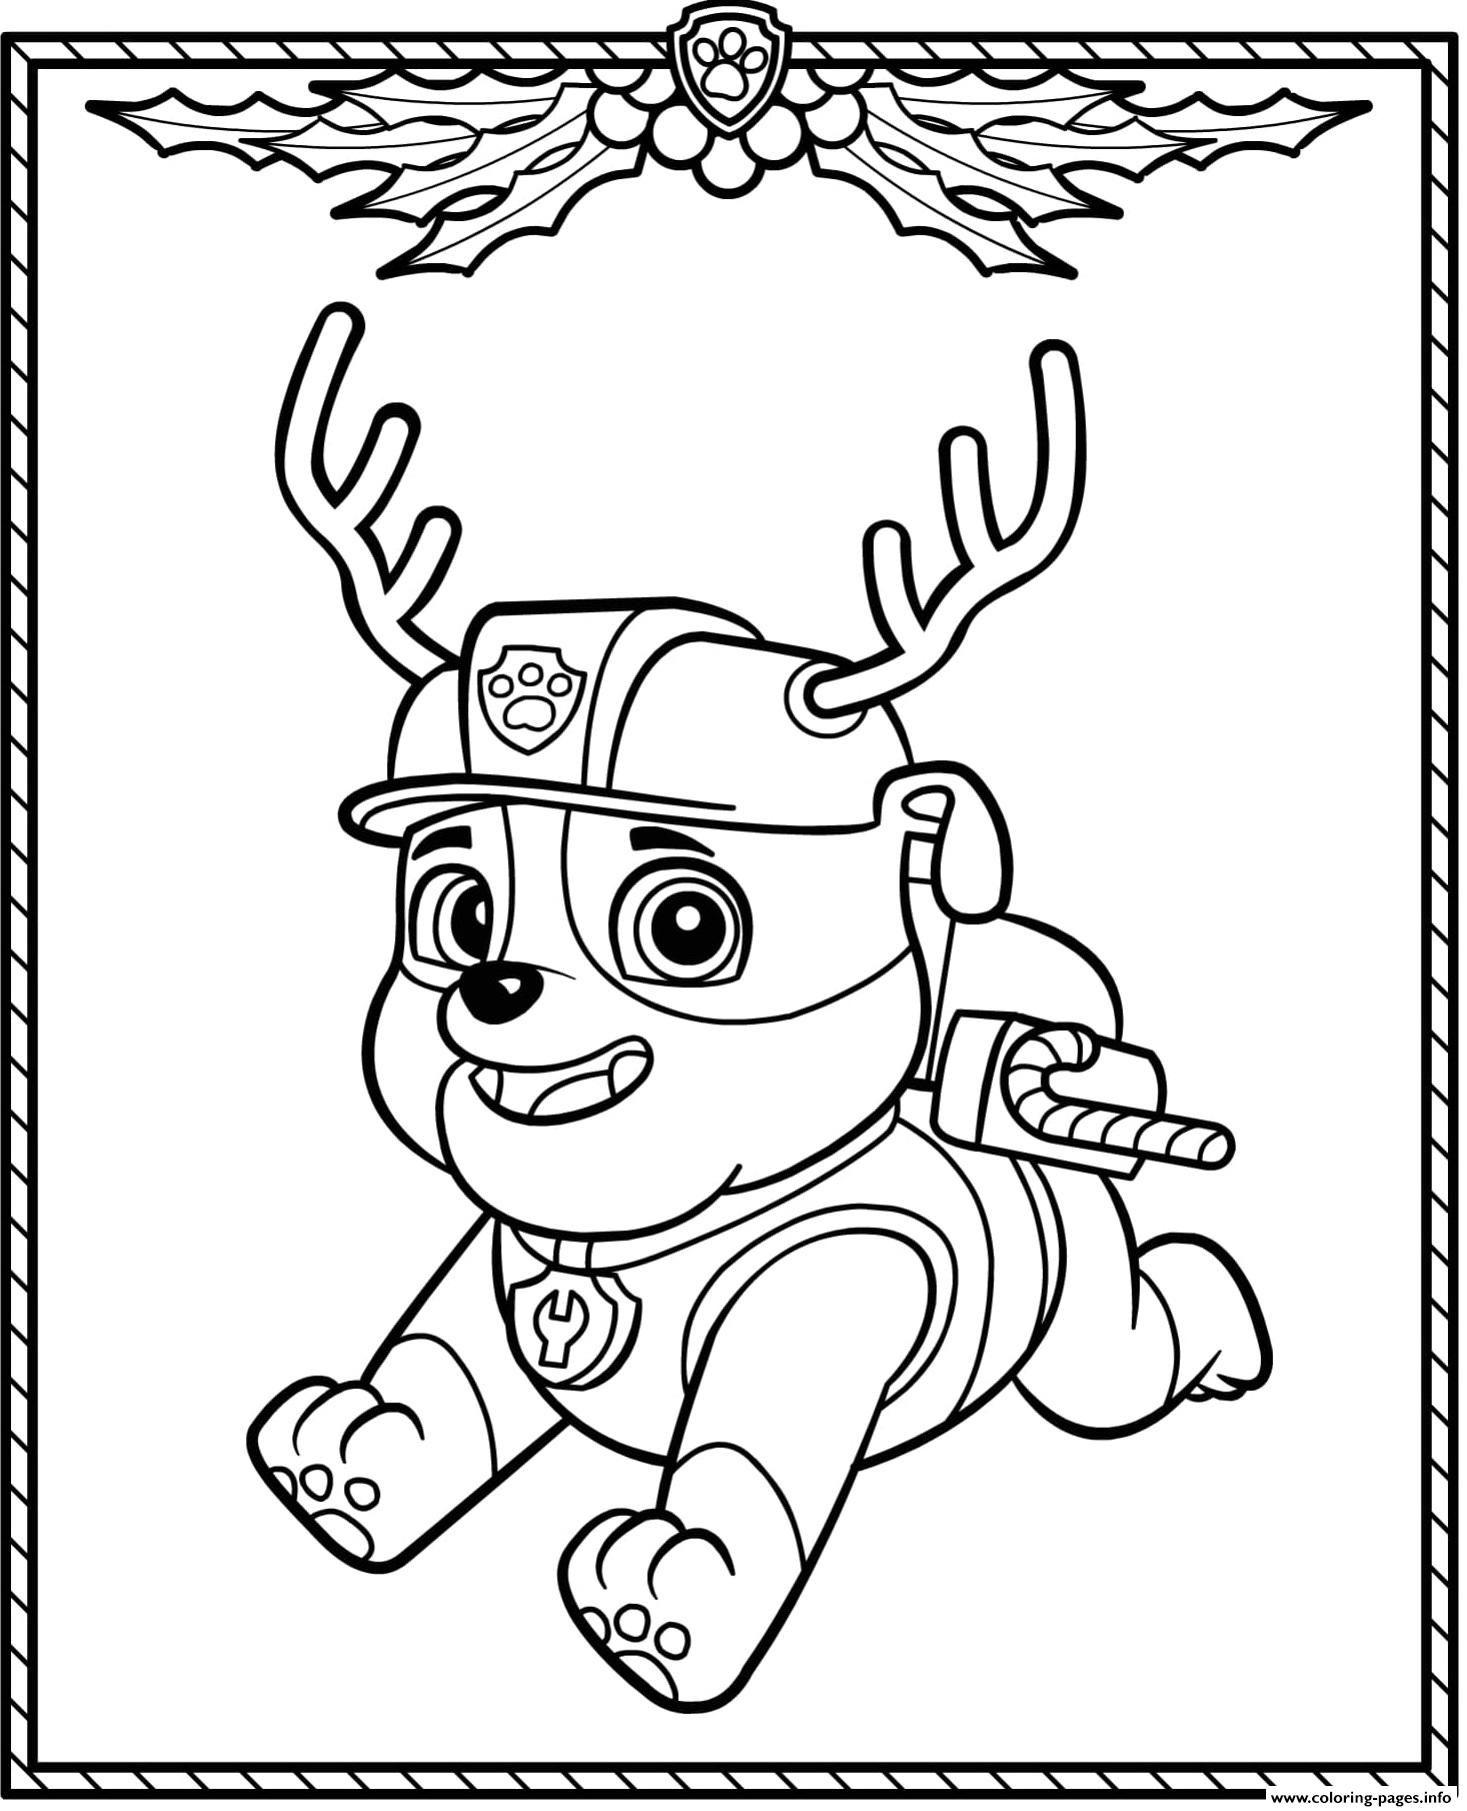 Print Paw Patrol Holiday Christmas Rubble Coloring Pages Paw Patrol Christmas Paw Patrol Coloring Paw Patrol Coloring Pages